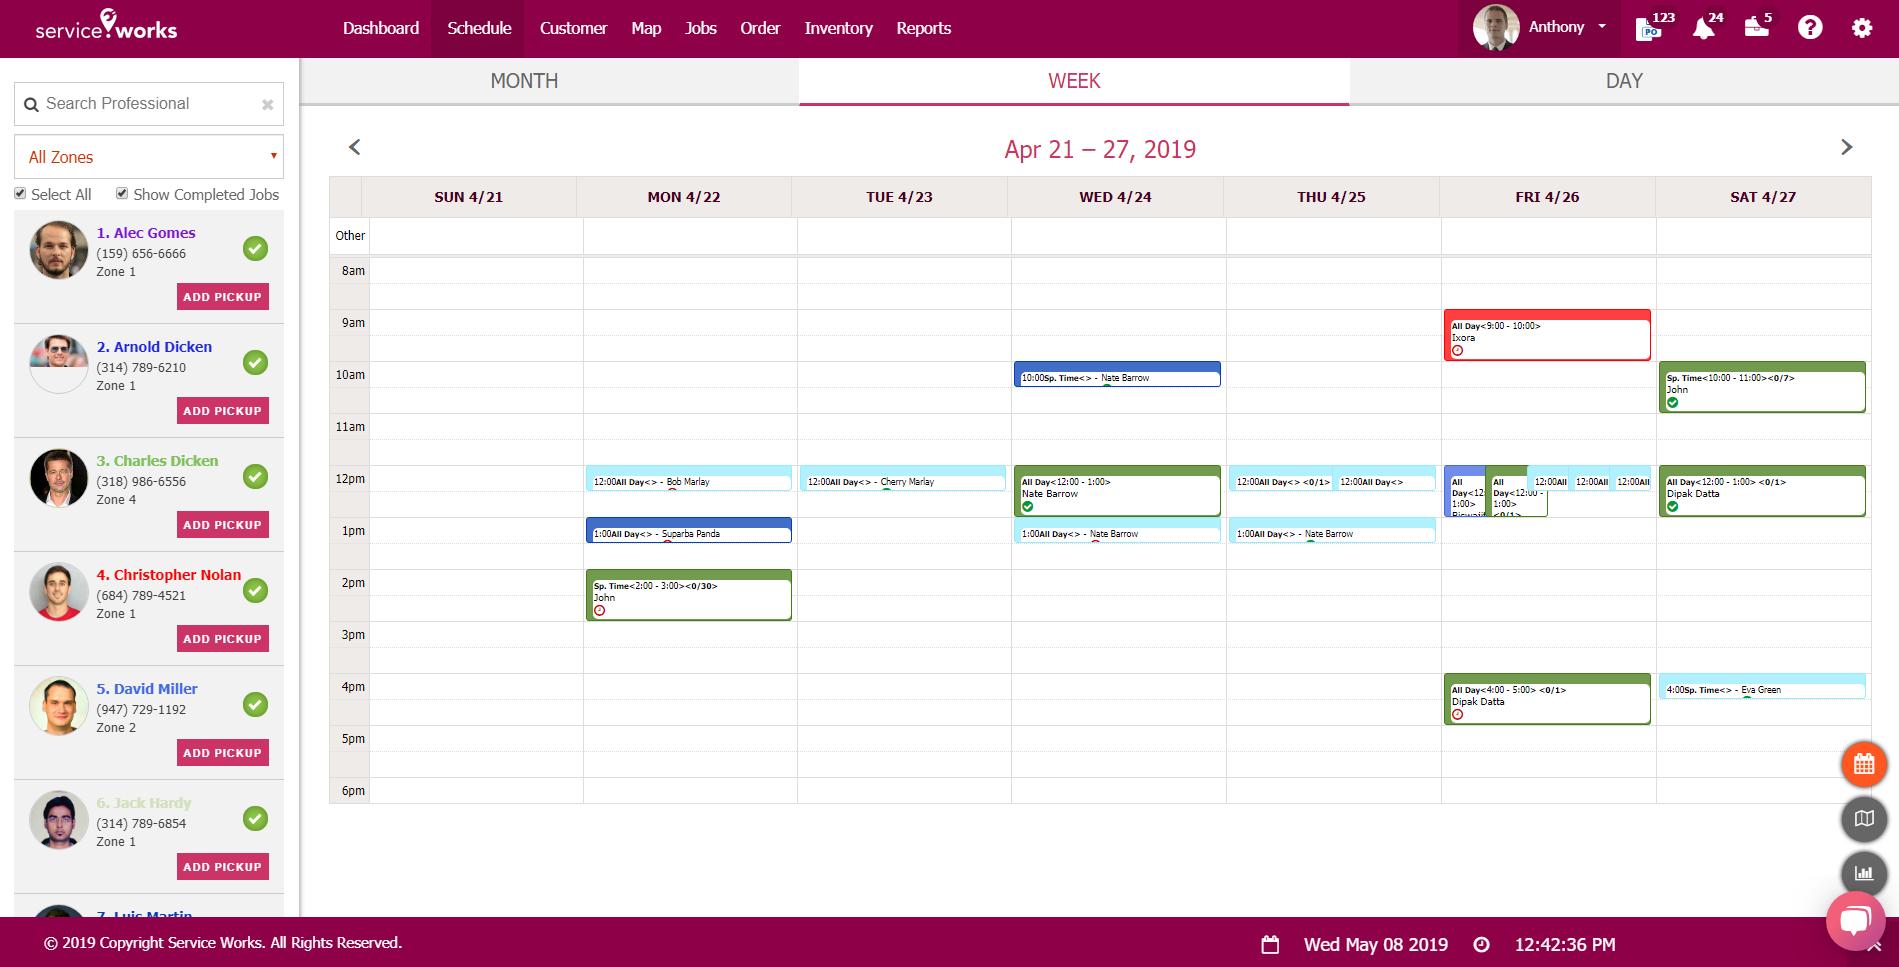 Schedule map